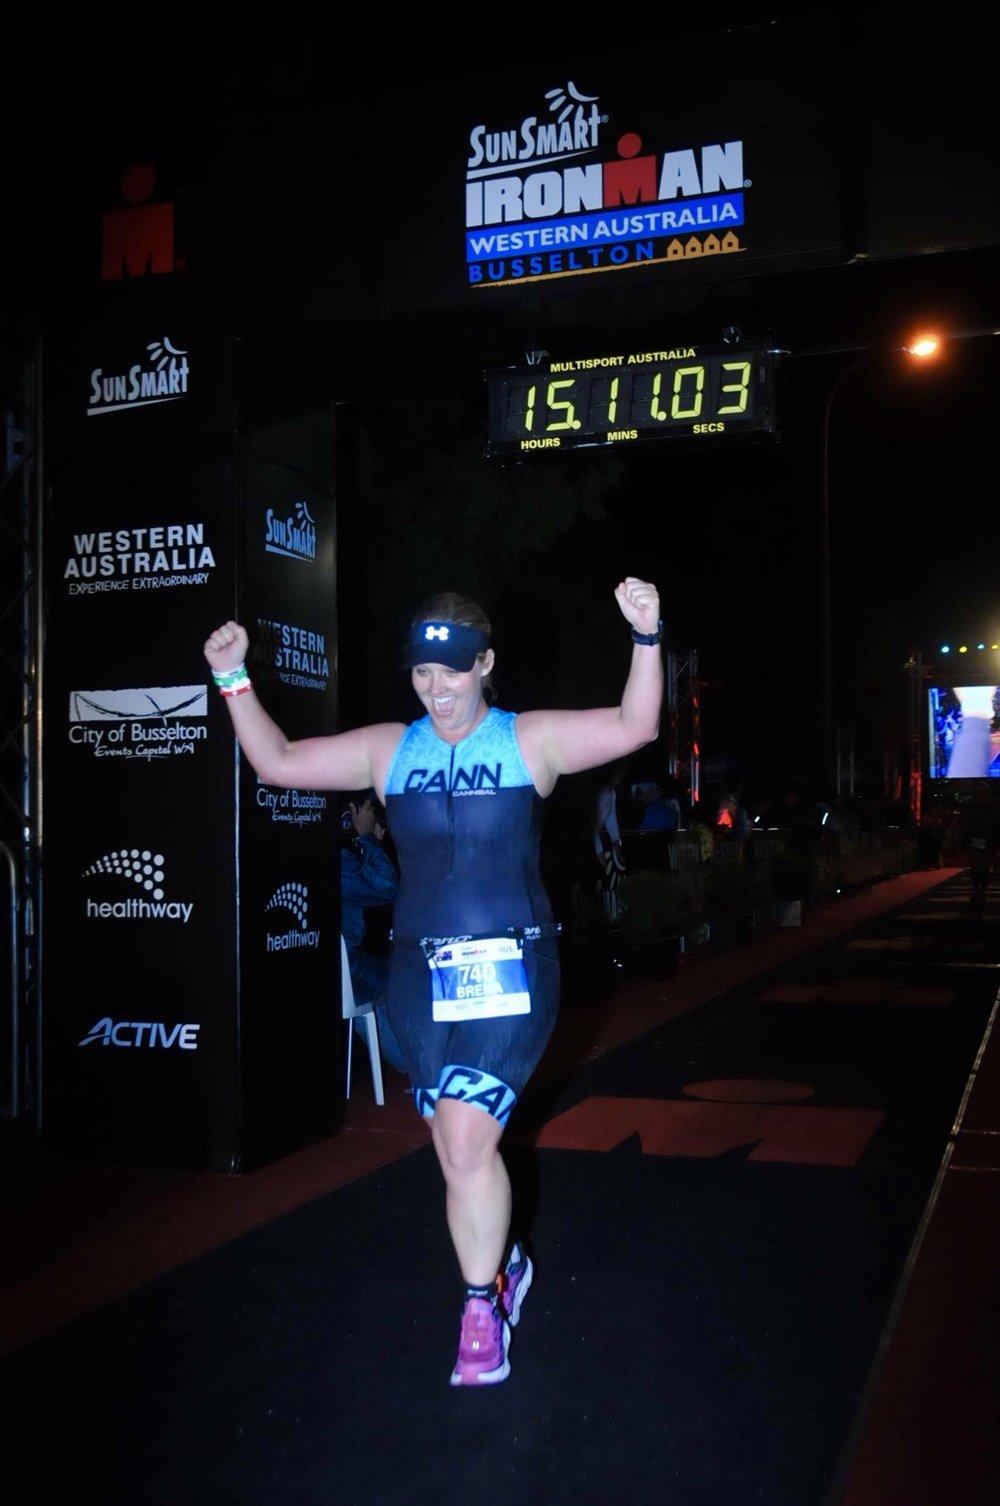 Western Australia Ironman 2016